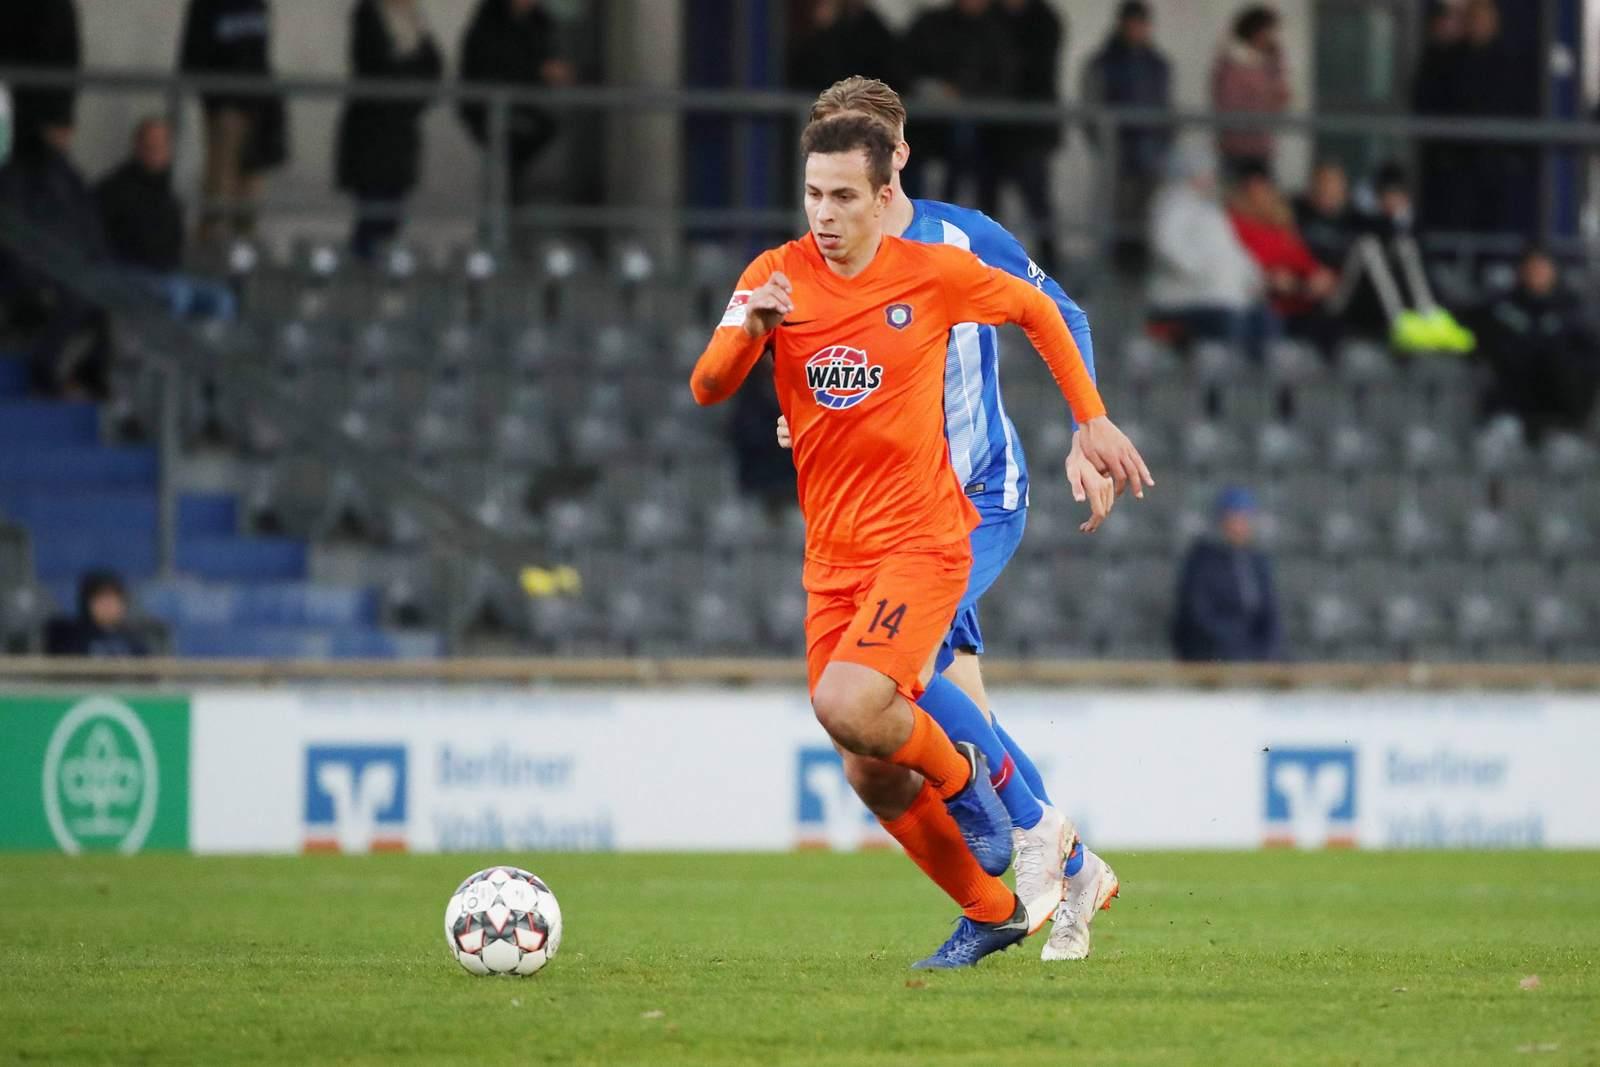 Maximilian Pronichev am Ball für Erzgebirge Aue